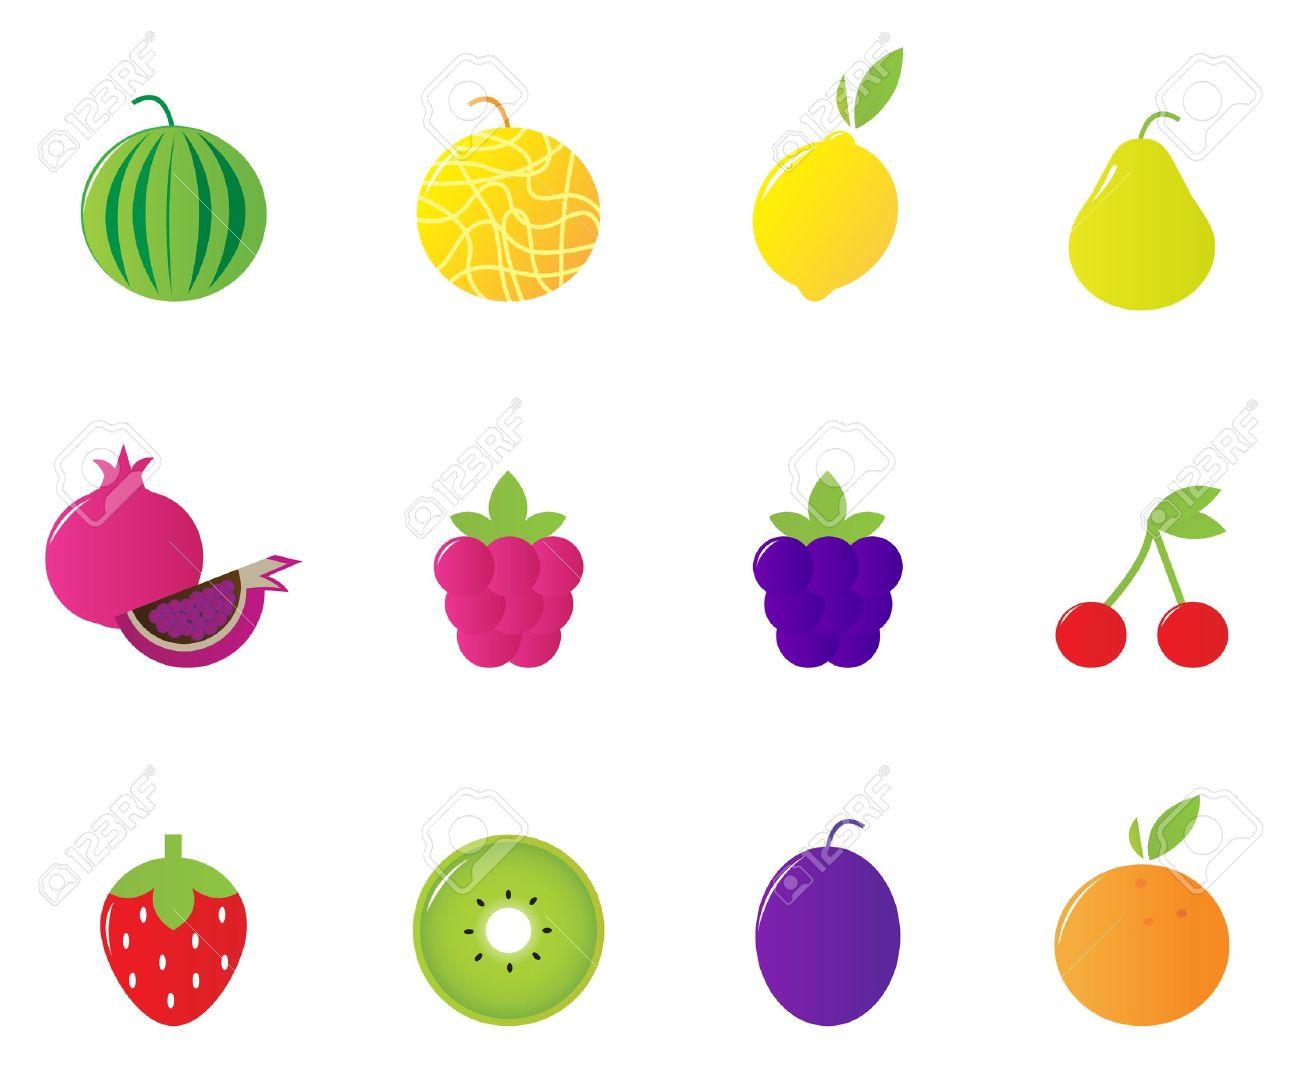 Cute Watermelon Clipart 12 fruit and berries cute